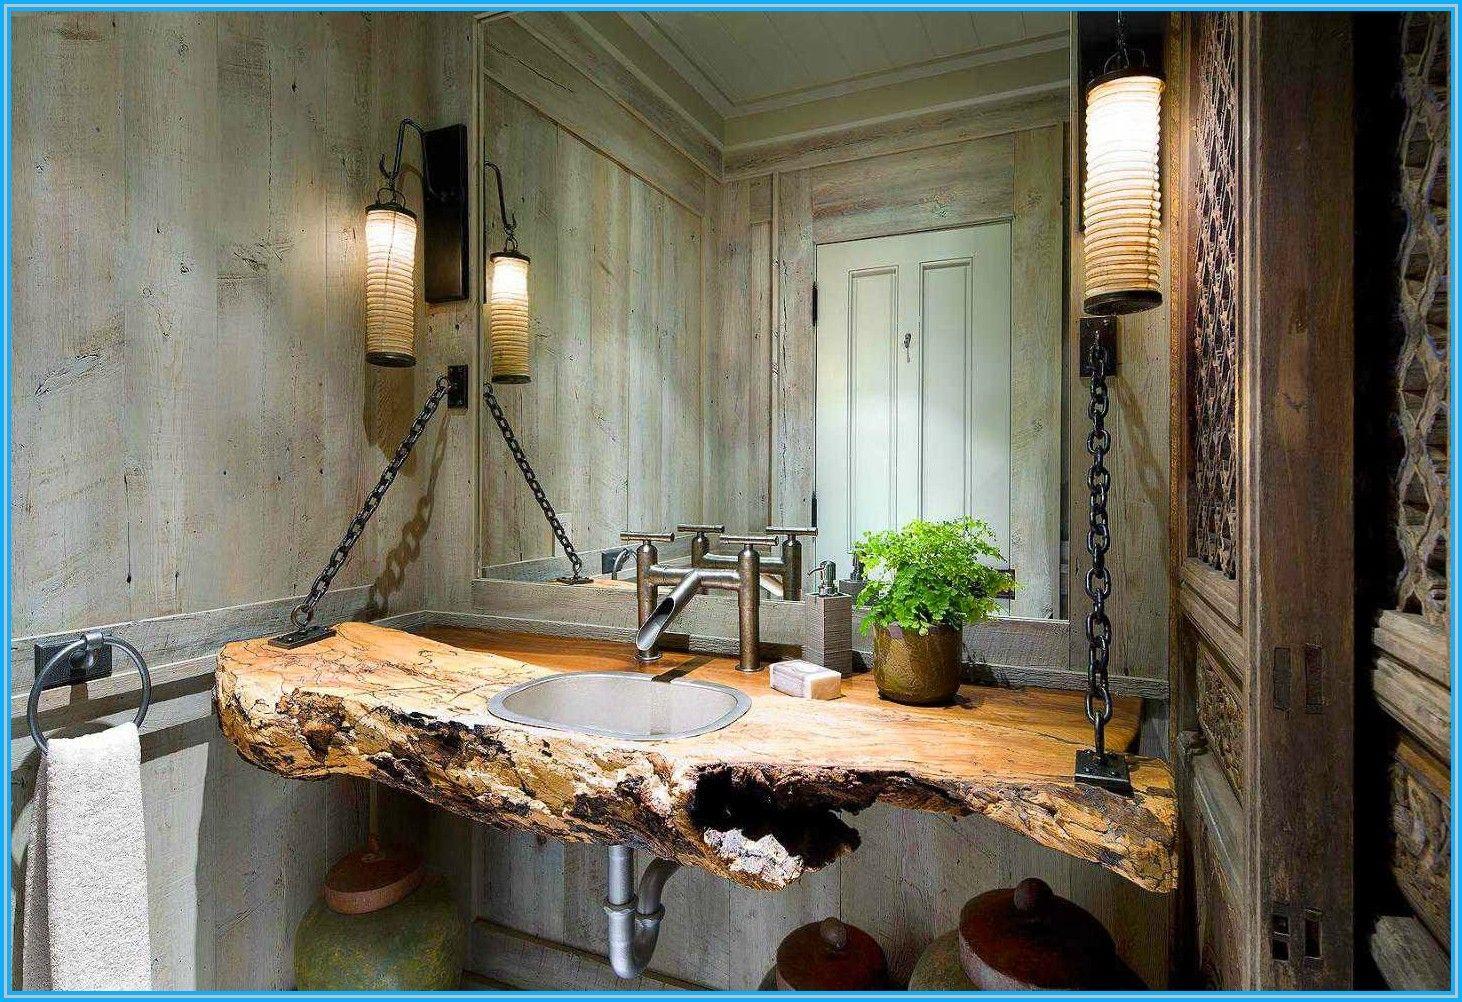 Rustikale vintage badezimmer dekor rustikale badezimmer dekor clearance badezimmer  badezimmer